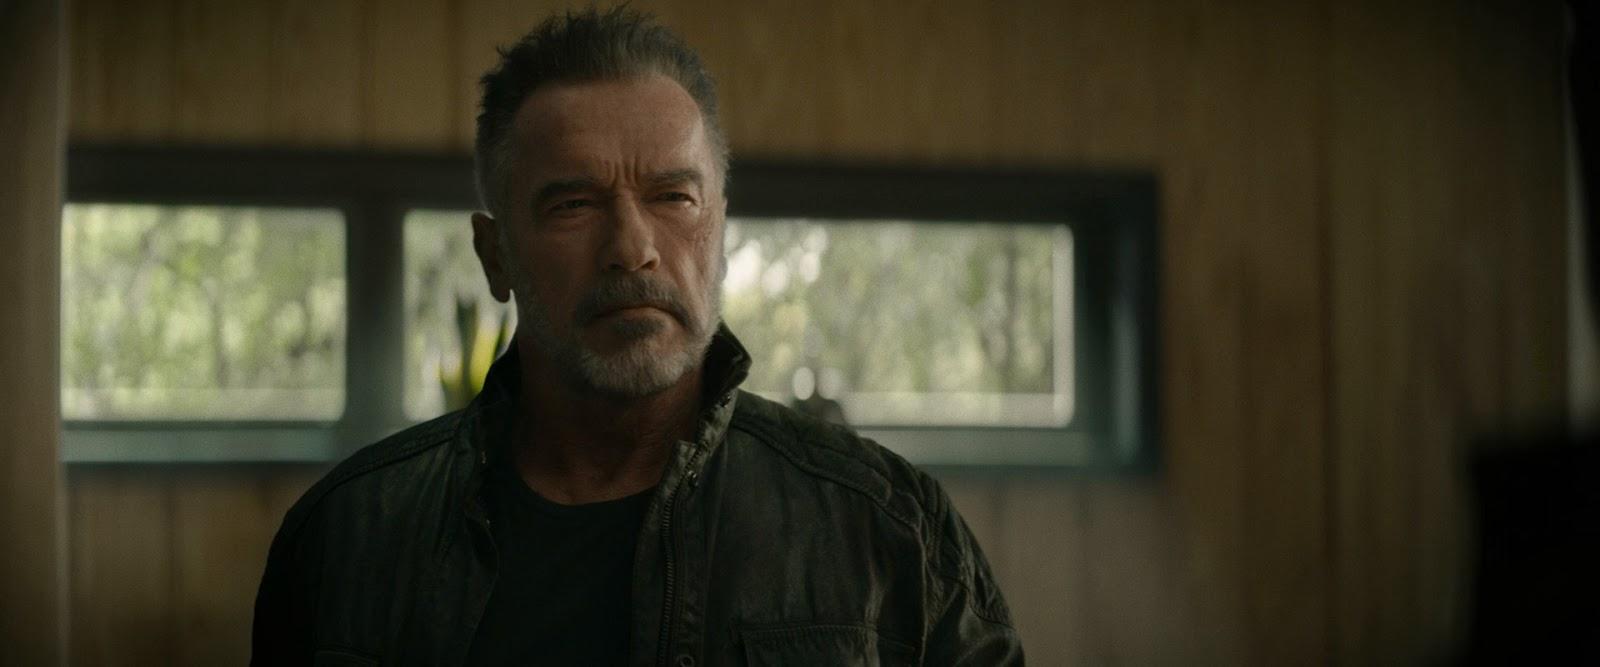 Terminator+Destino+oculto+%282019%29+HD+1080p+WEB-DL+AMZN+Latino+-+Ingles+-+Descargatepelis.com.mkv_snapshot_01.20.36_%5B2020.01.14_02.45.55%5D.jpg (1600×667)